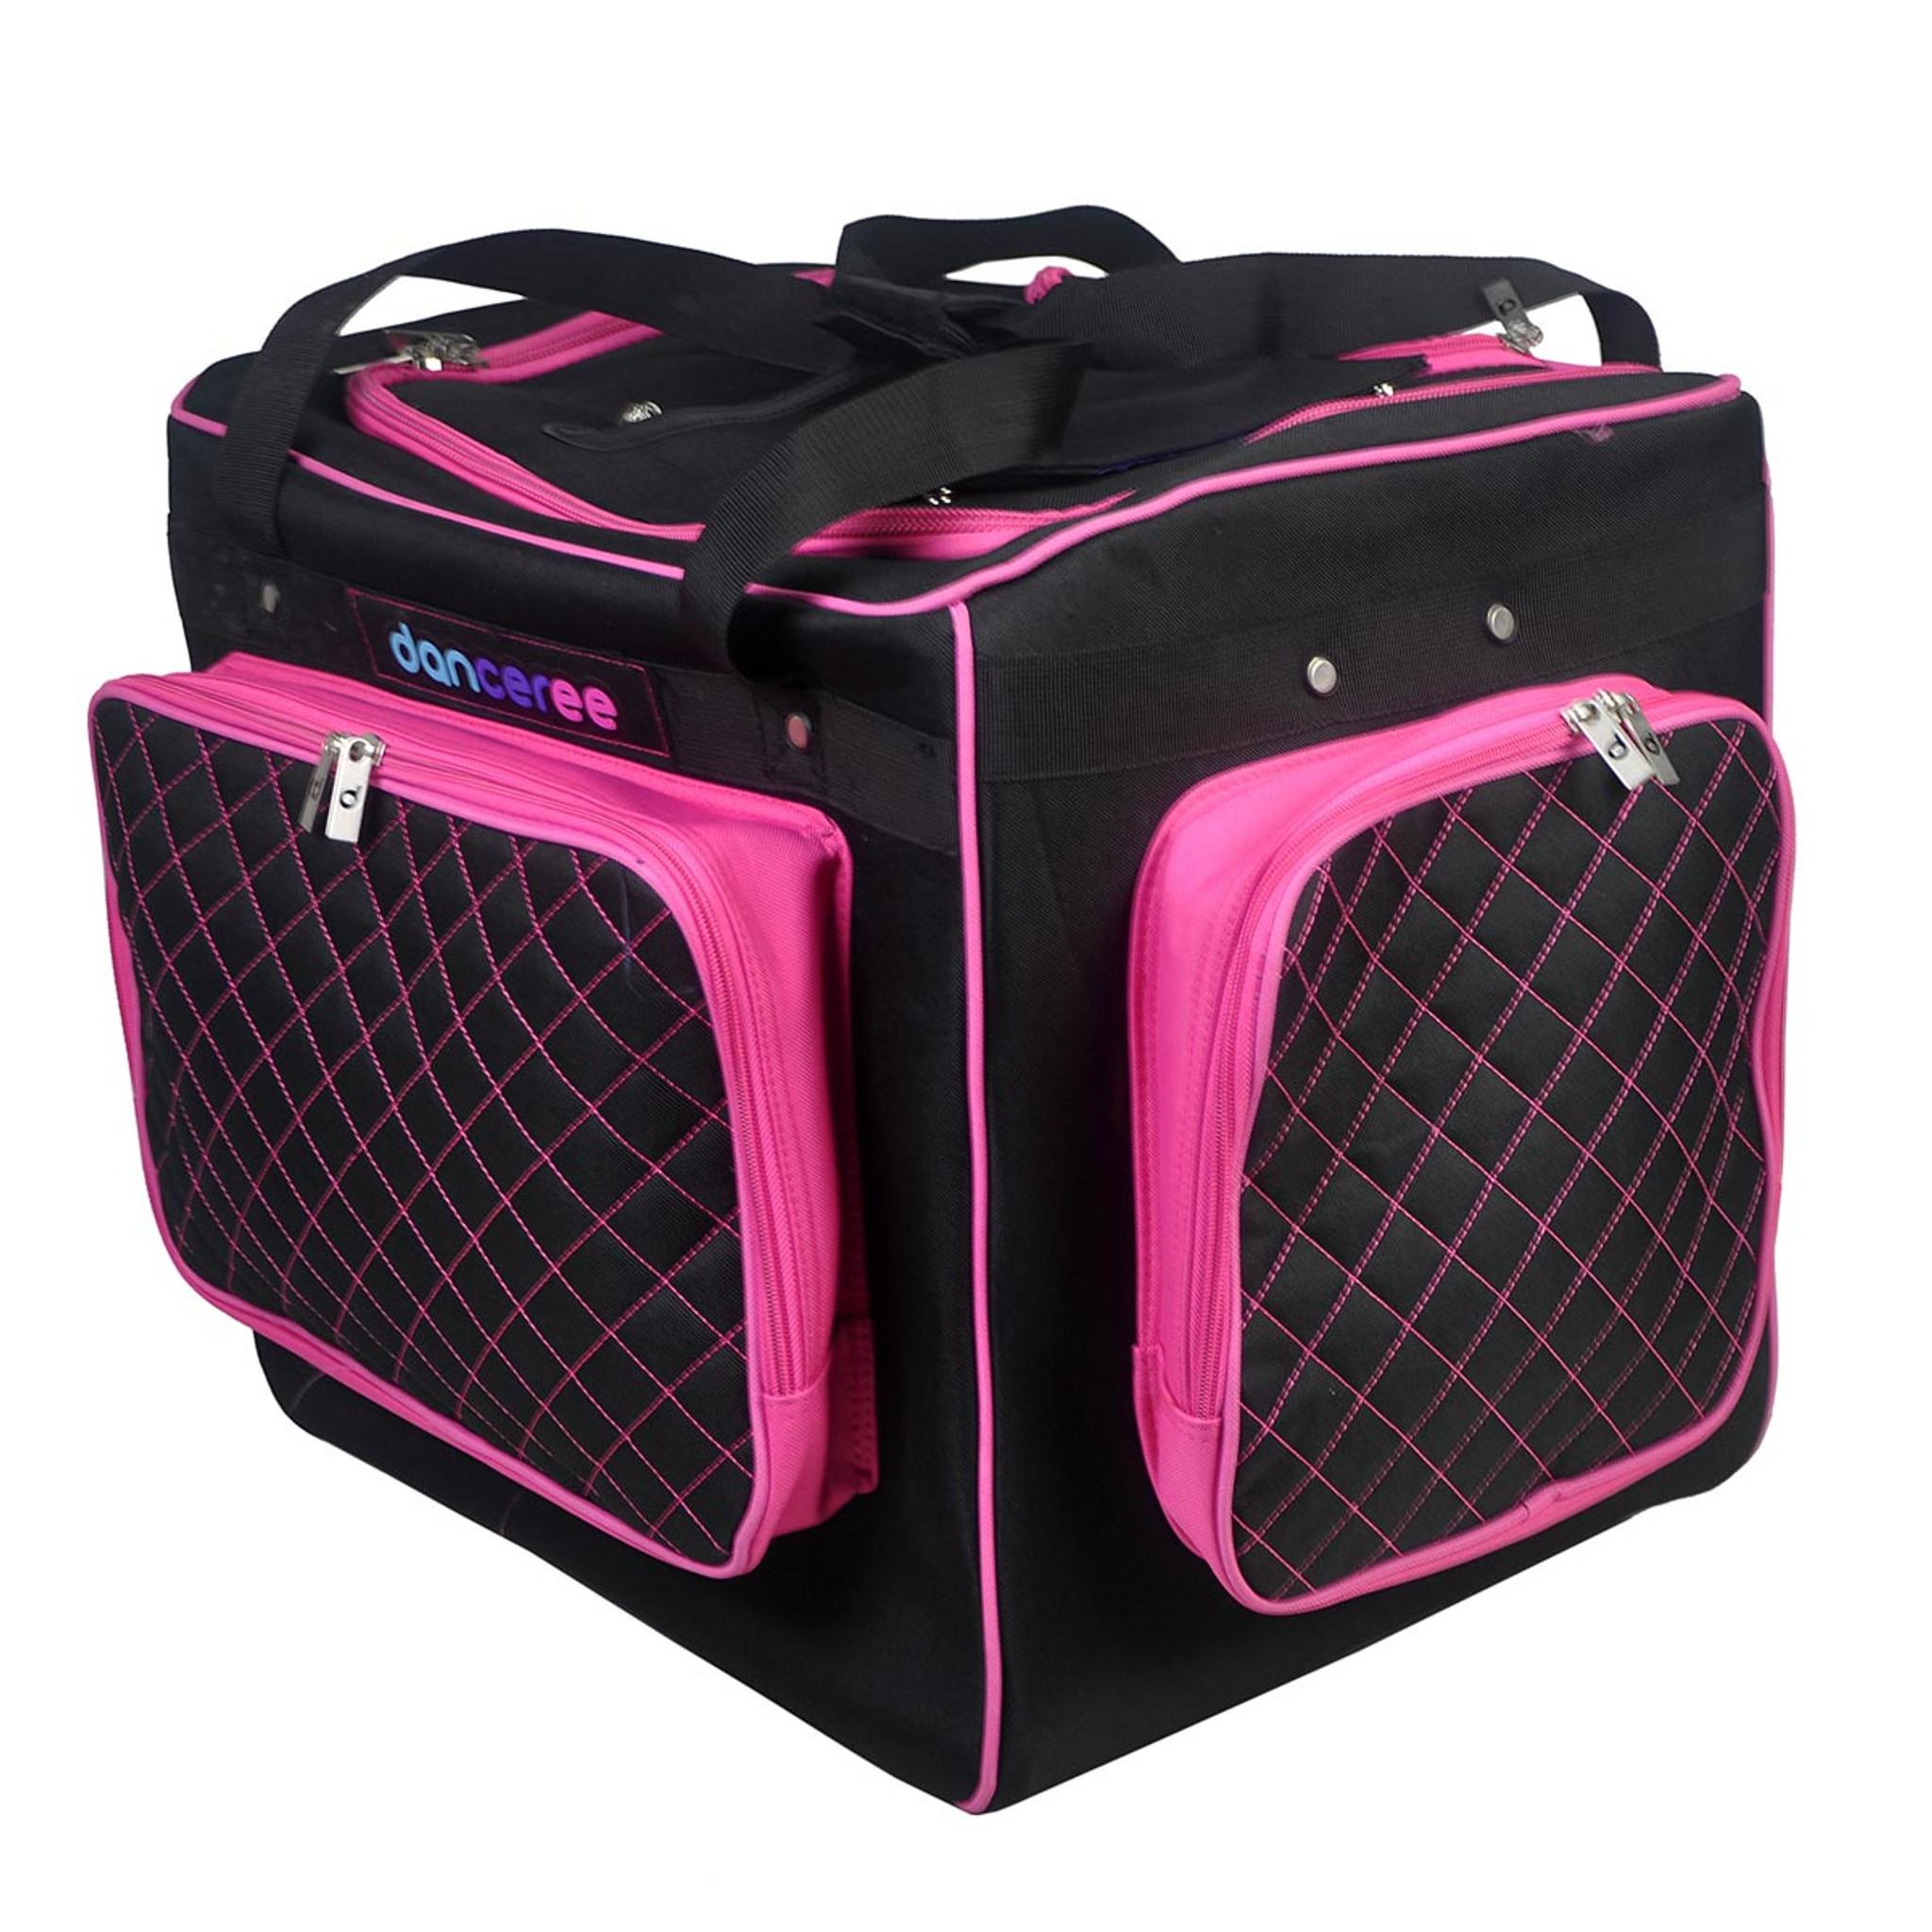 Danceree Demi Roller - Dancewear Garment Bag